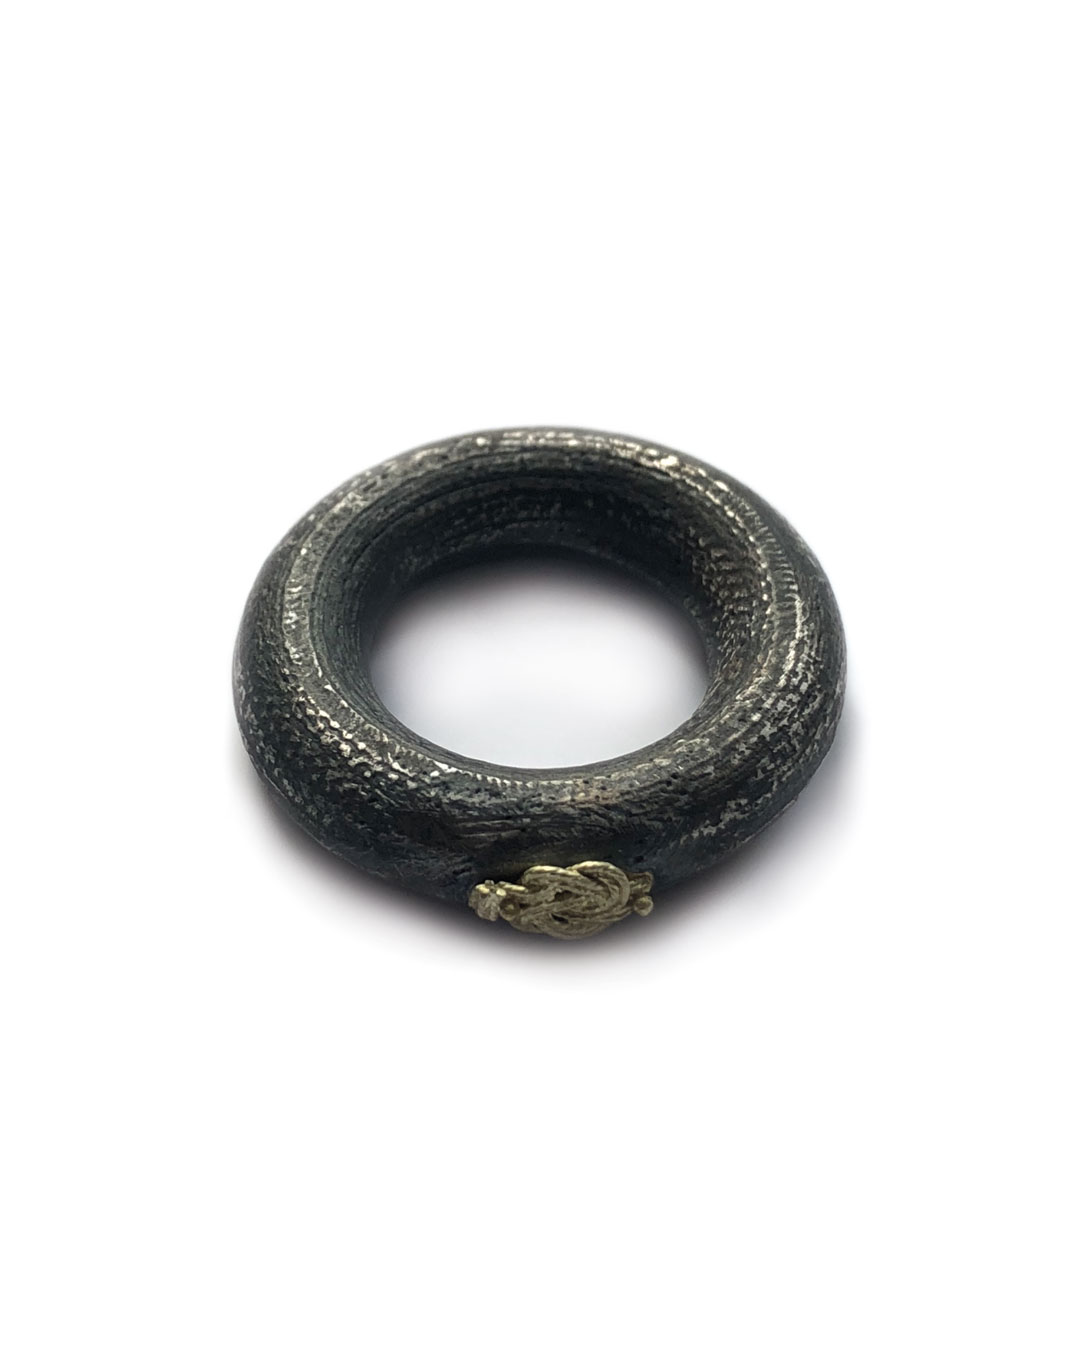 Chequita Nahar, Matti, 2017, ring; silver, 24ct gold, 30 x 30 x 8 mm, €445